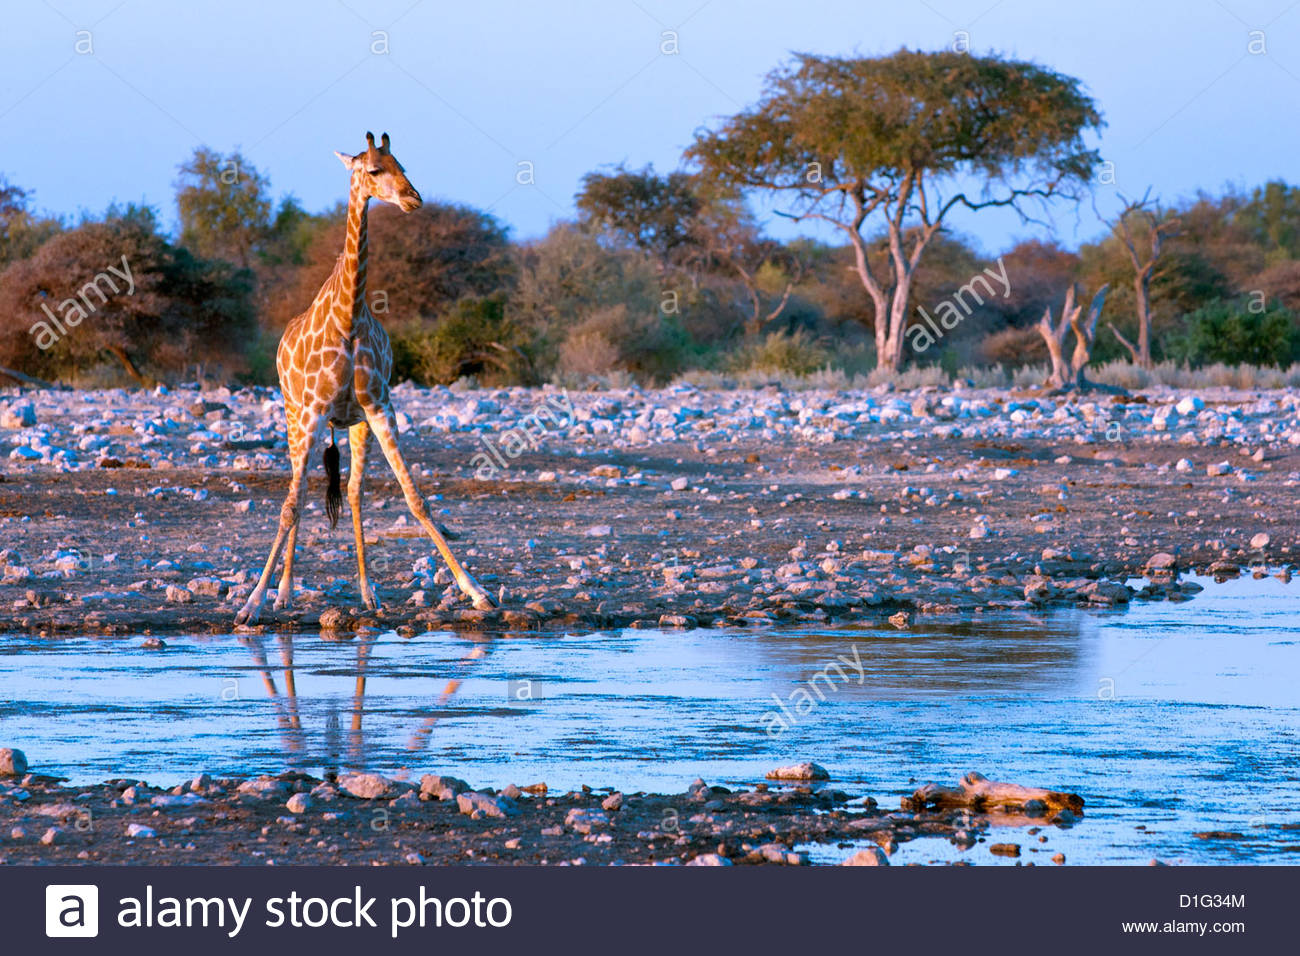 Giraffe (Giraffa camelopardis), Namibia, Africa - Stock Image